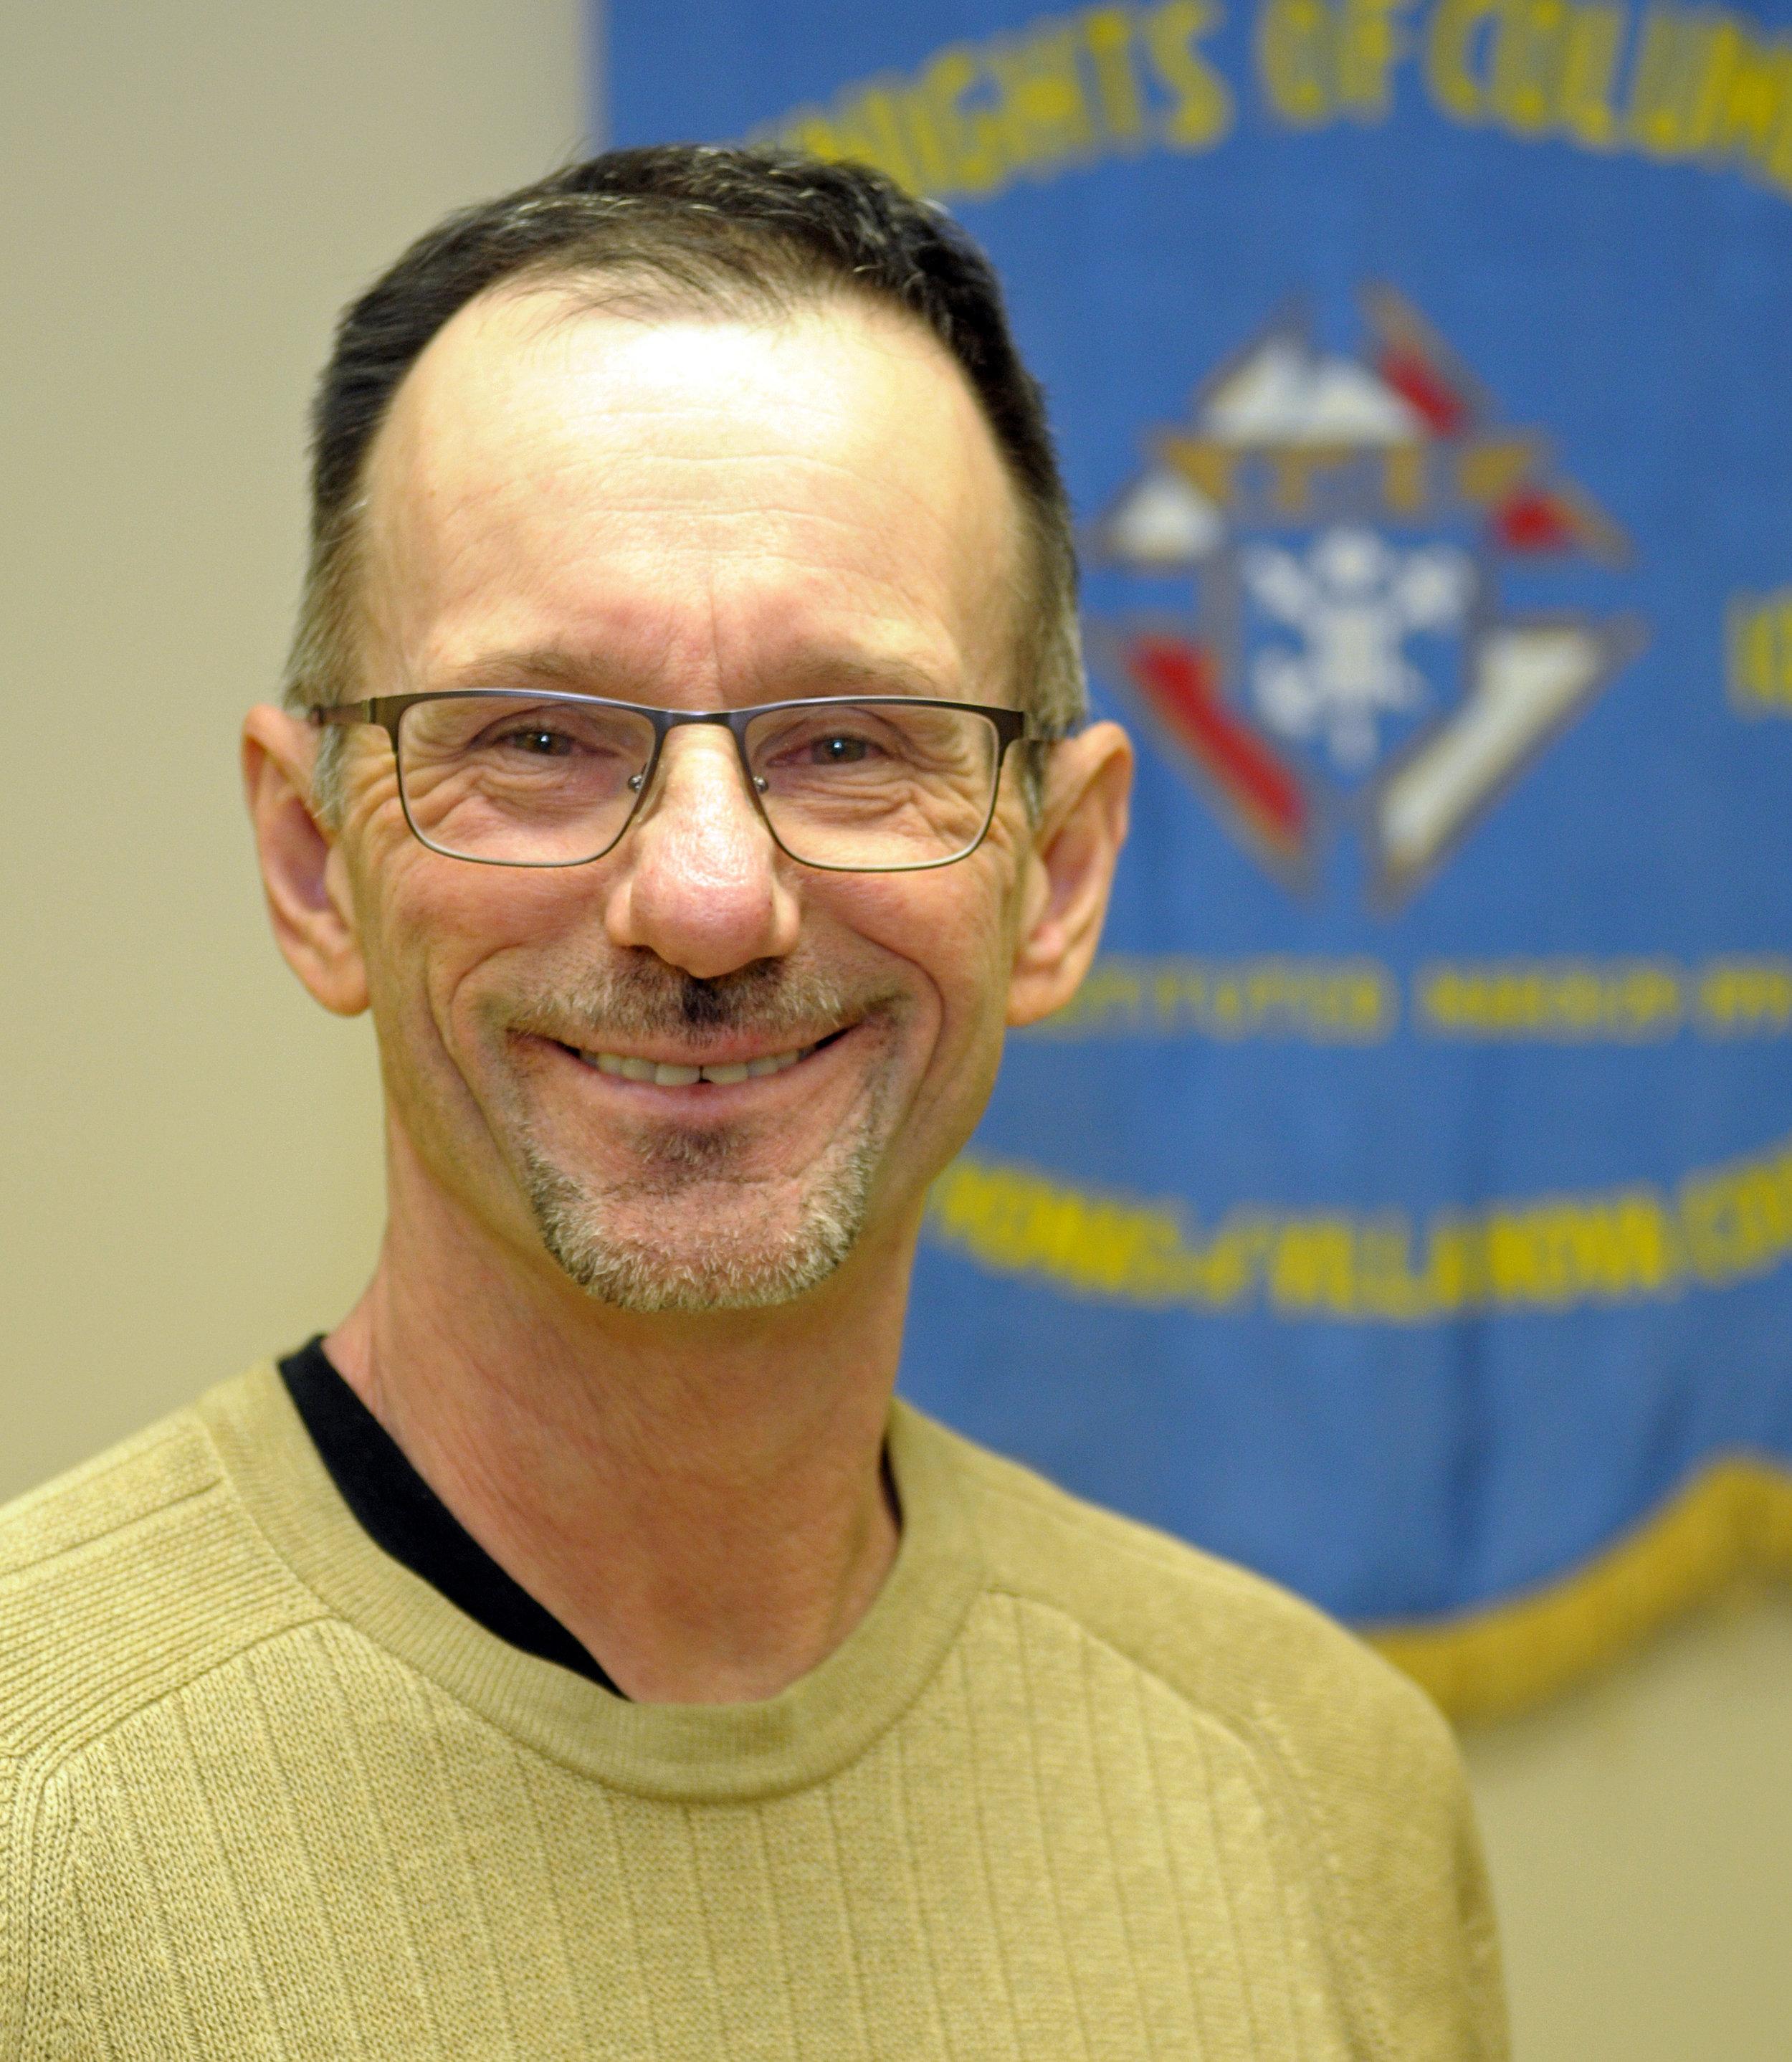 Rick Ottone -Chancellor